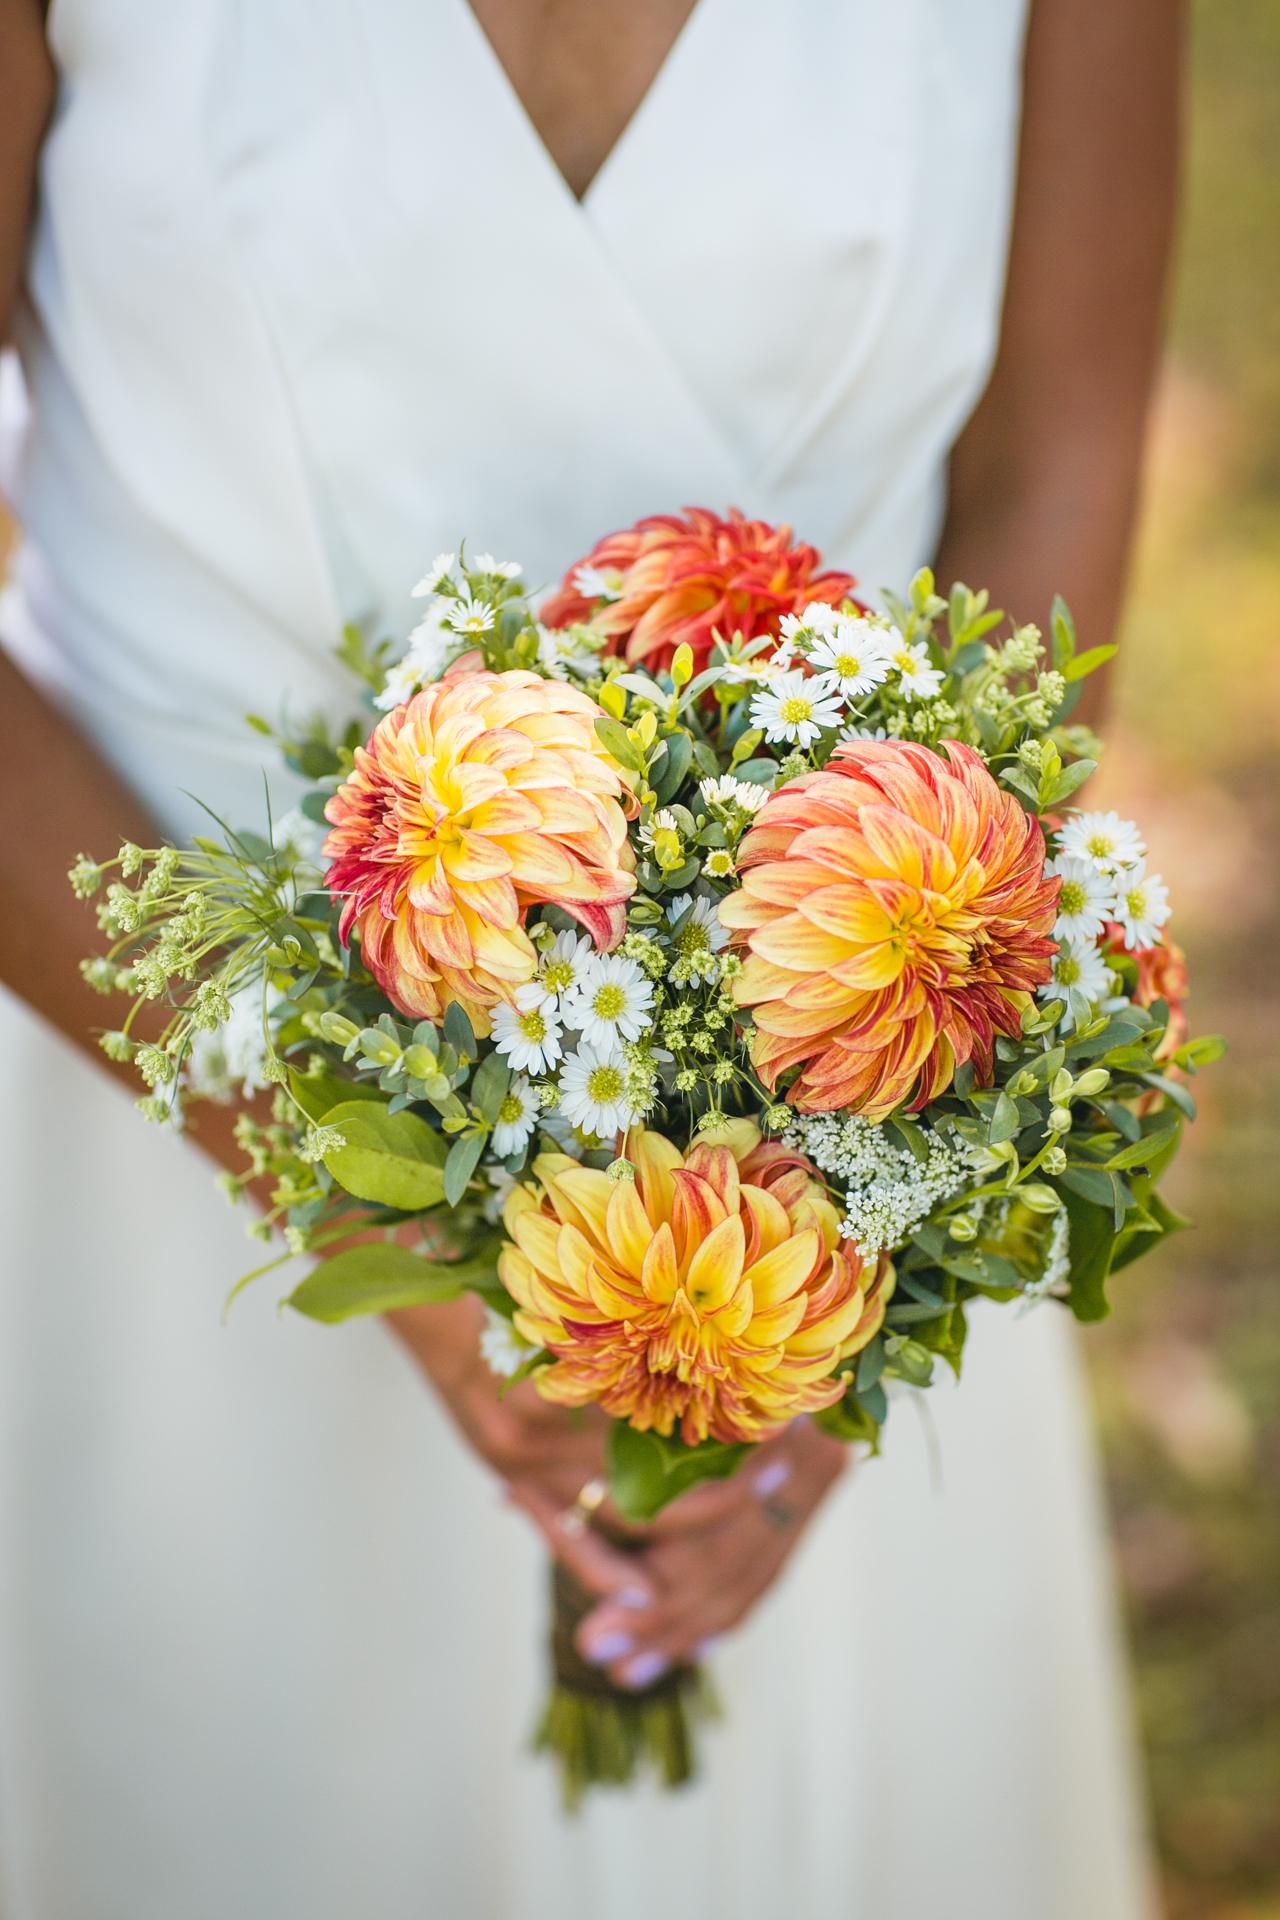 The bride holding her special arrangement floral bouquet